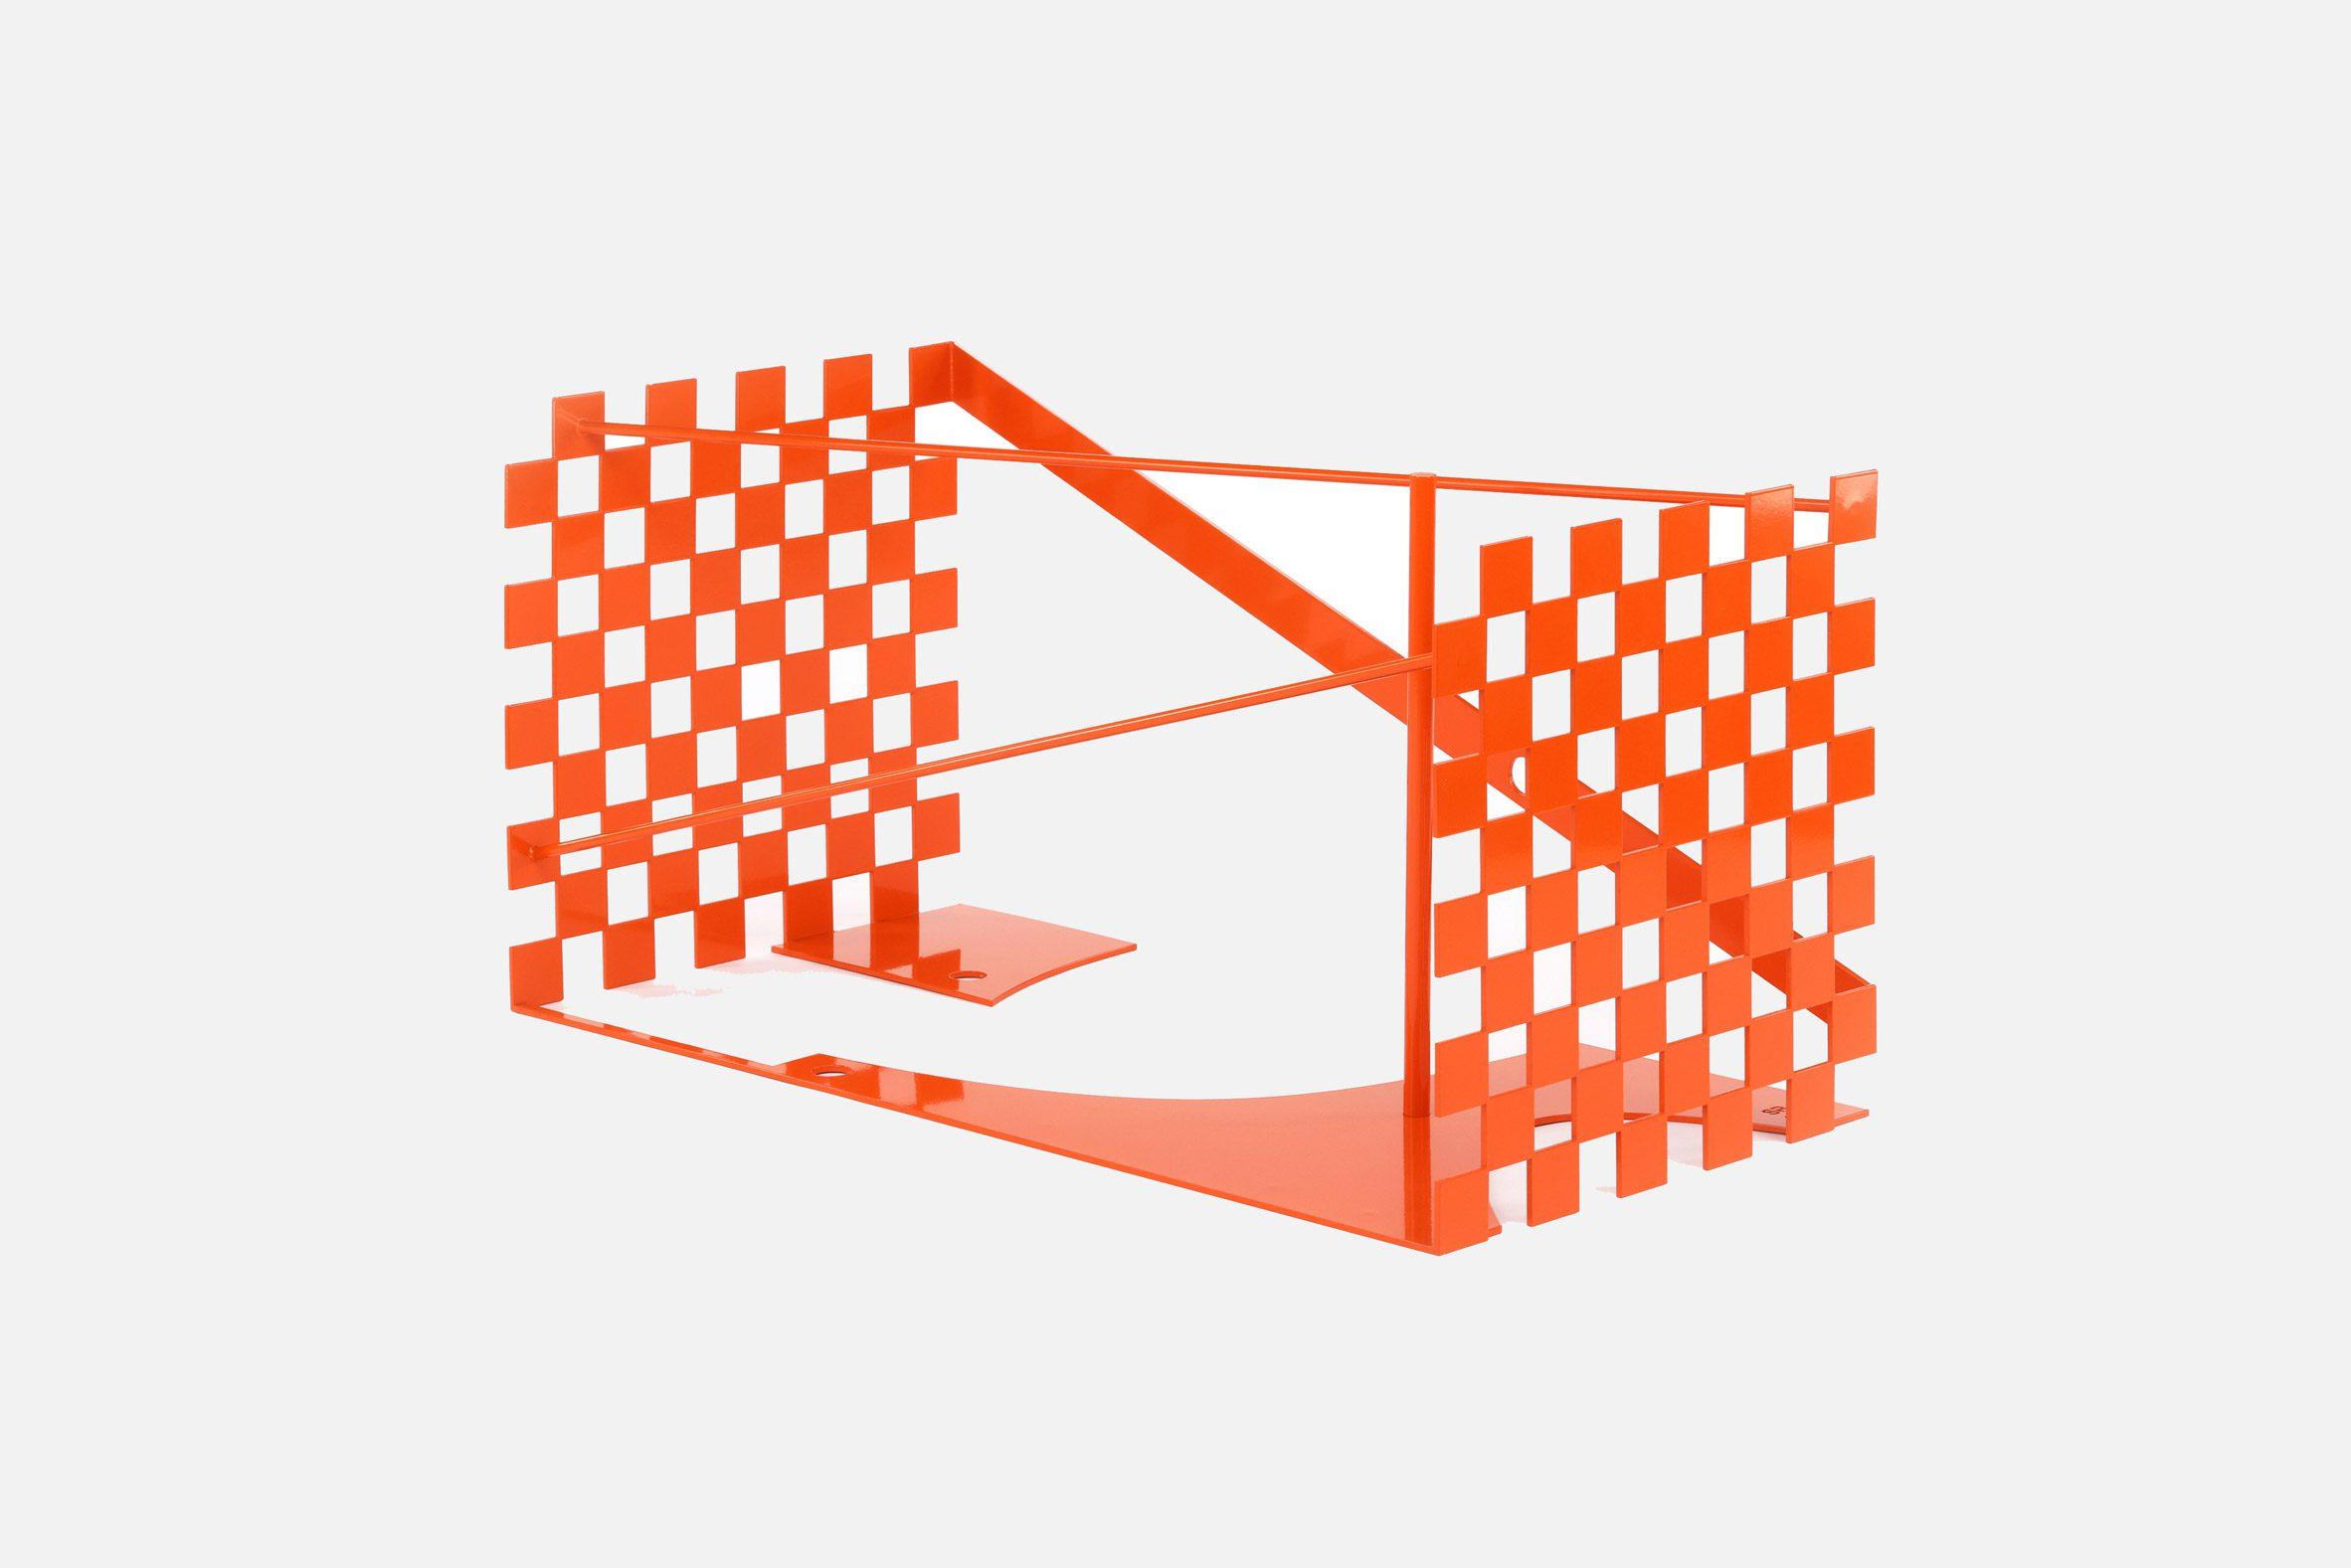 An orange trunk designed by Samuel Ross